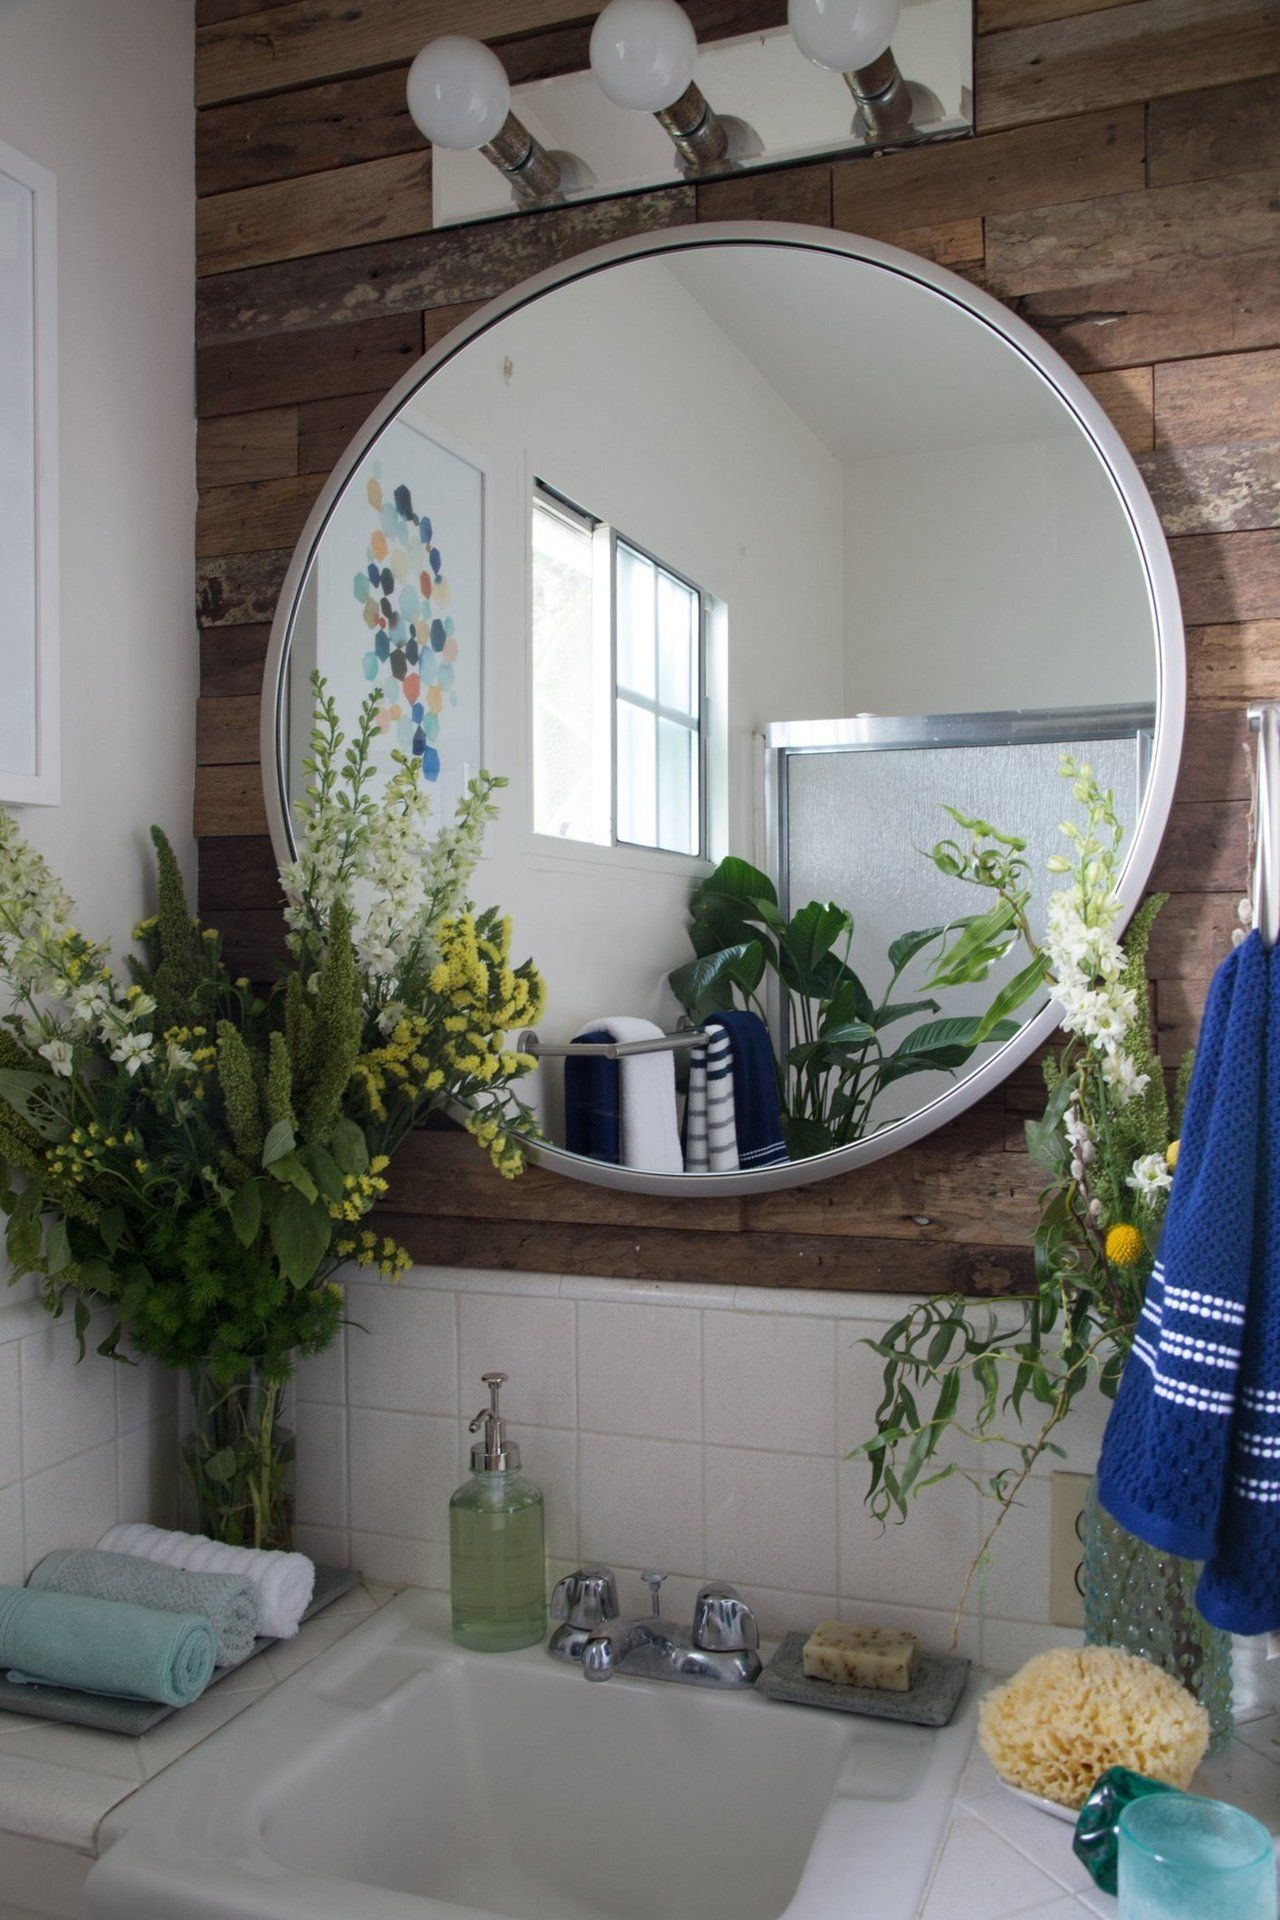 Erick's Modern Organic Burbank Mix | Bathroom, Wood wall ...